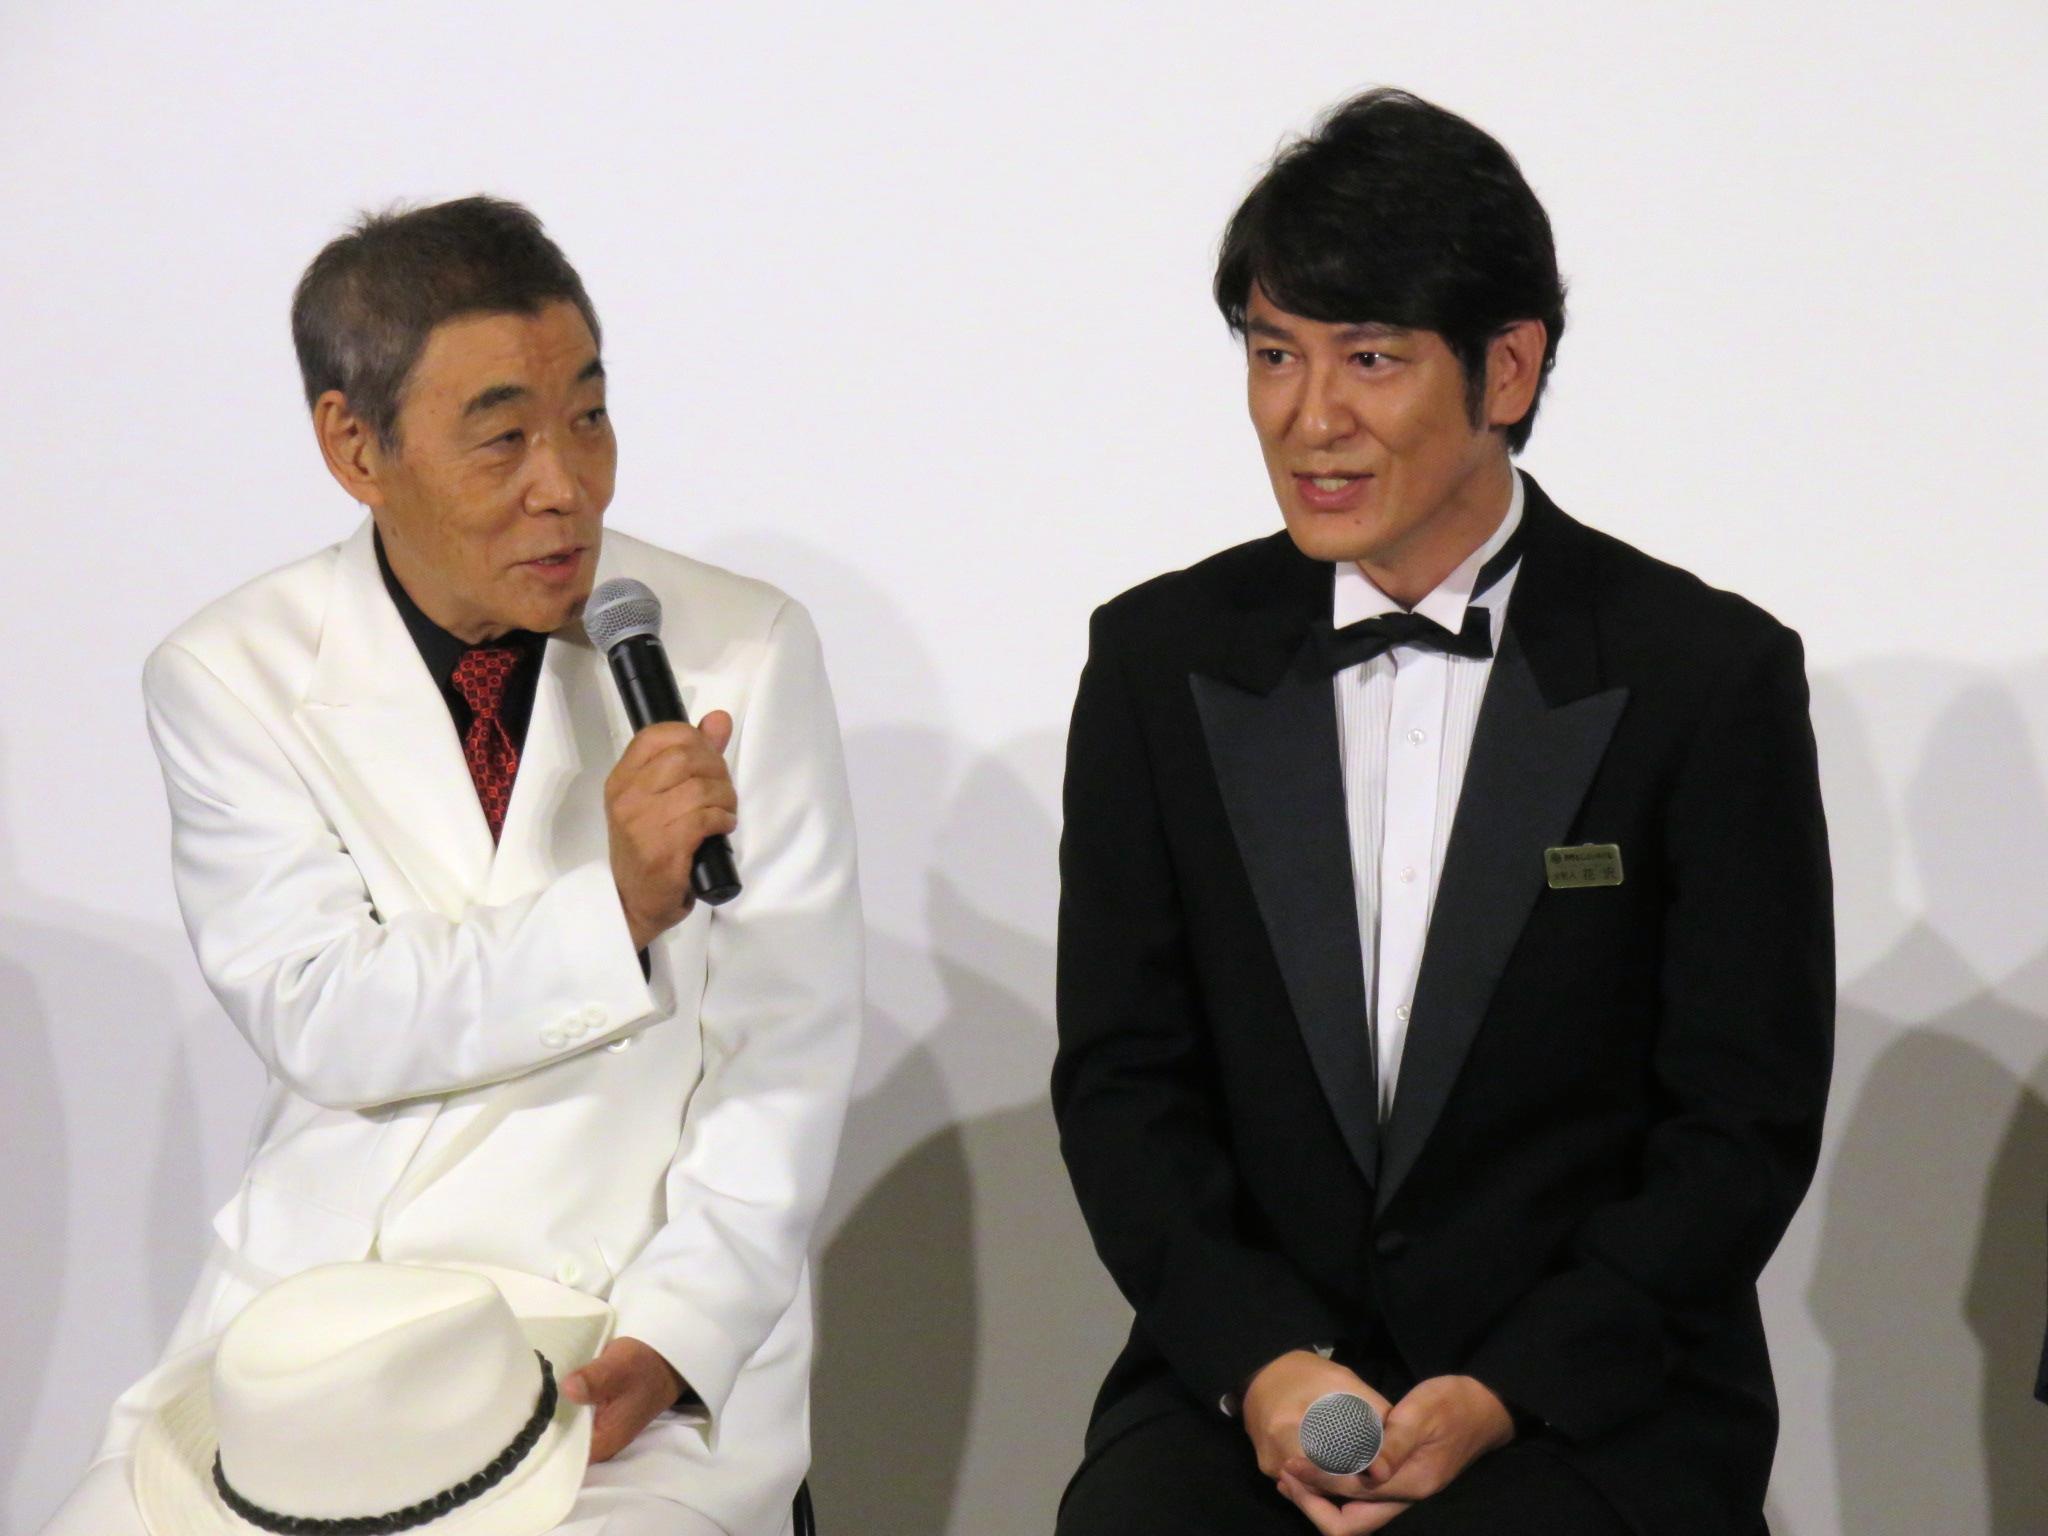 http://news.yoshimoto.co.jp/20171006210514-e825cb8c715b3f216652770ede82cf8f131c498c.jpg